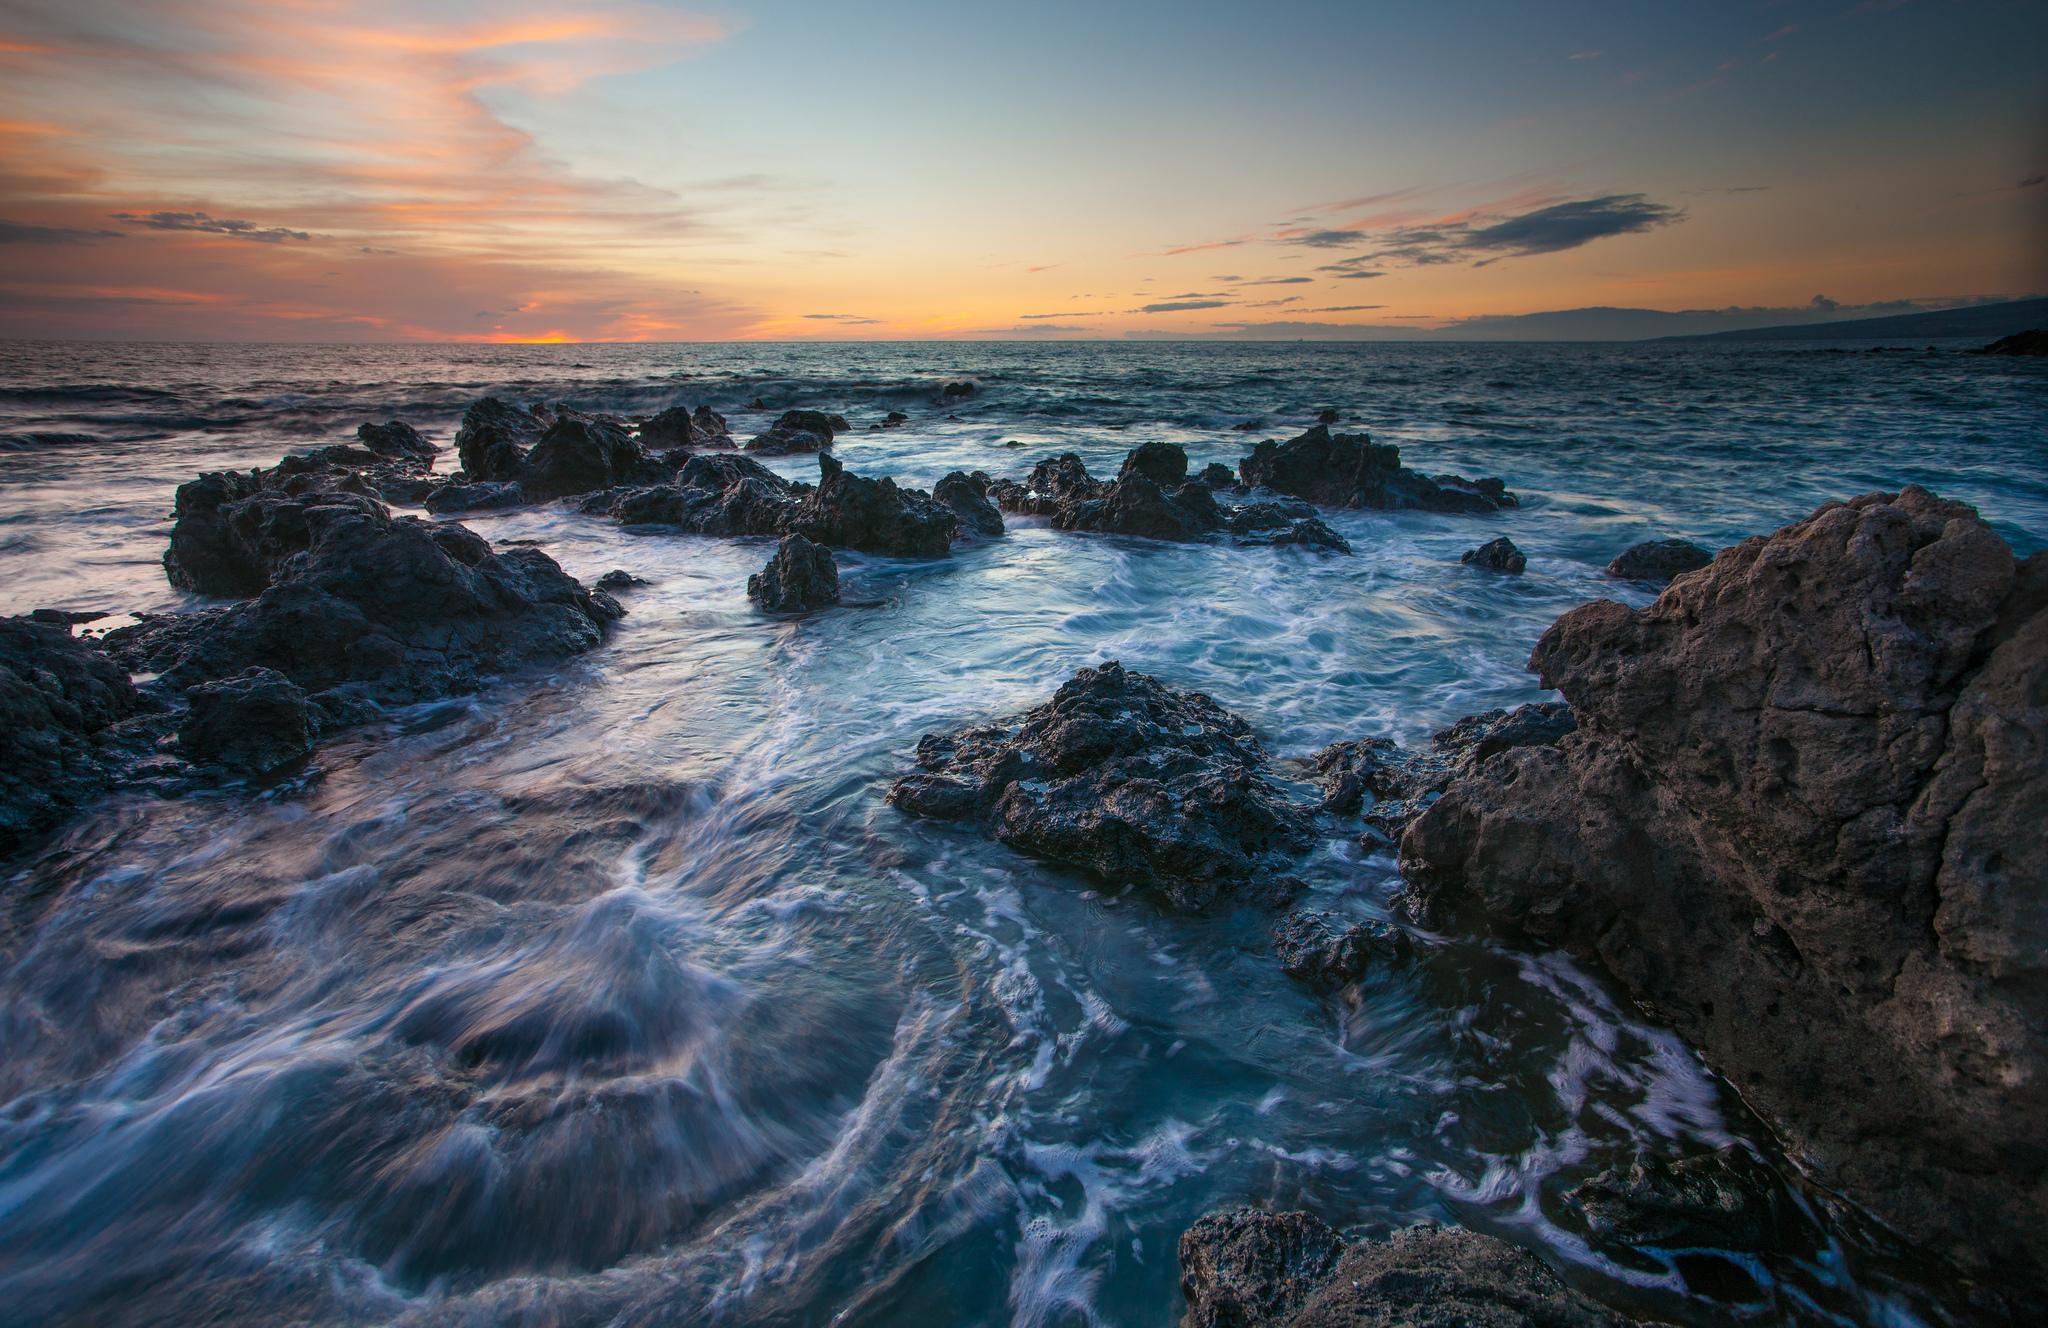 море океан камни скалы закат sea the ocean stones rock sunset  № 2530594 загрузить